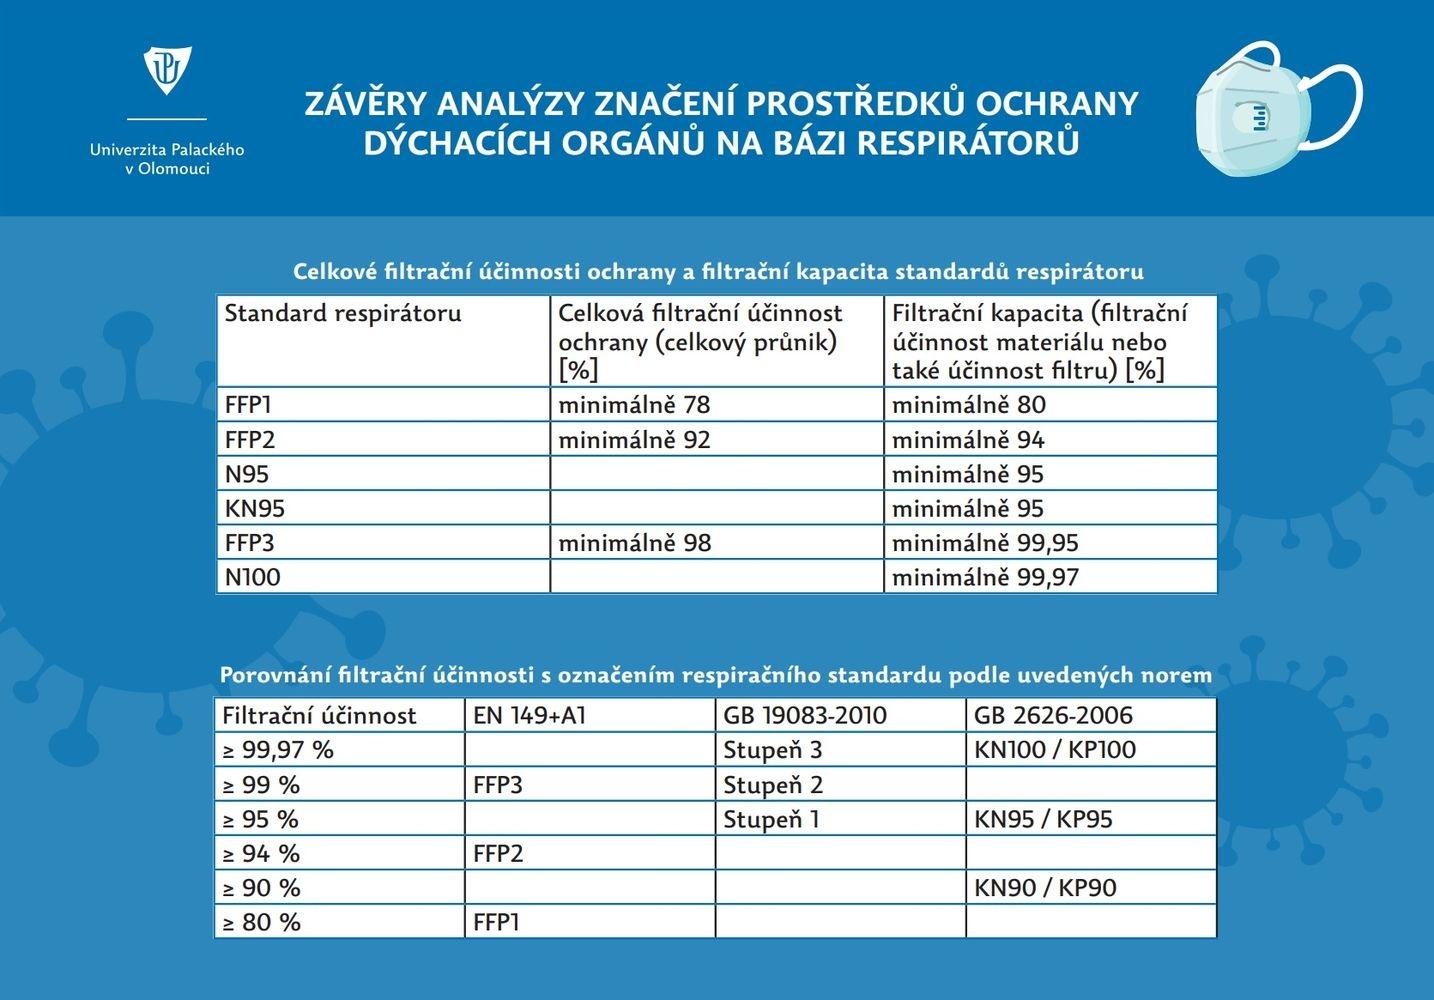 tabulka zdroj: upol.cz